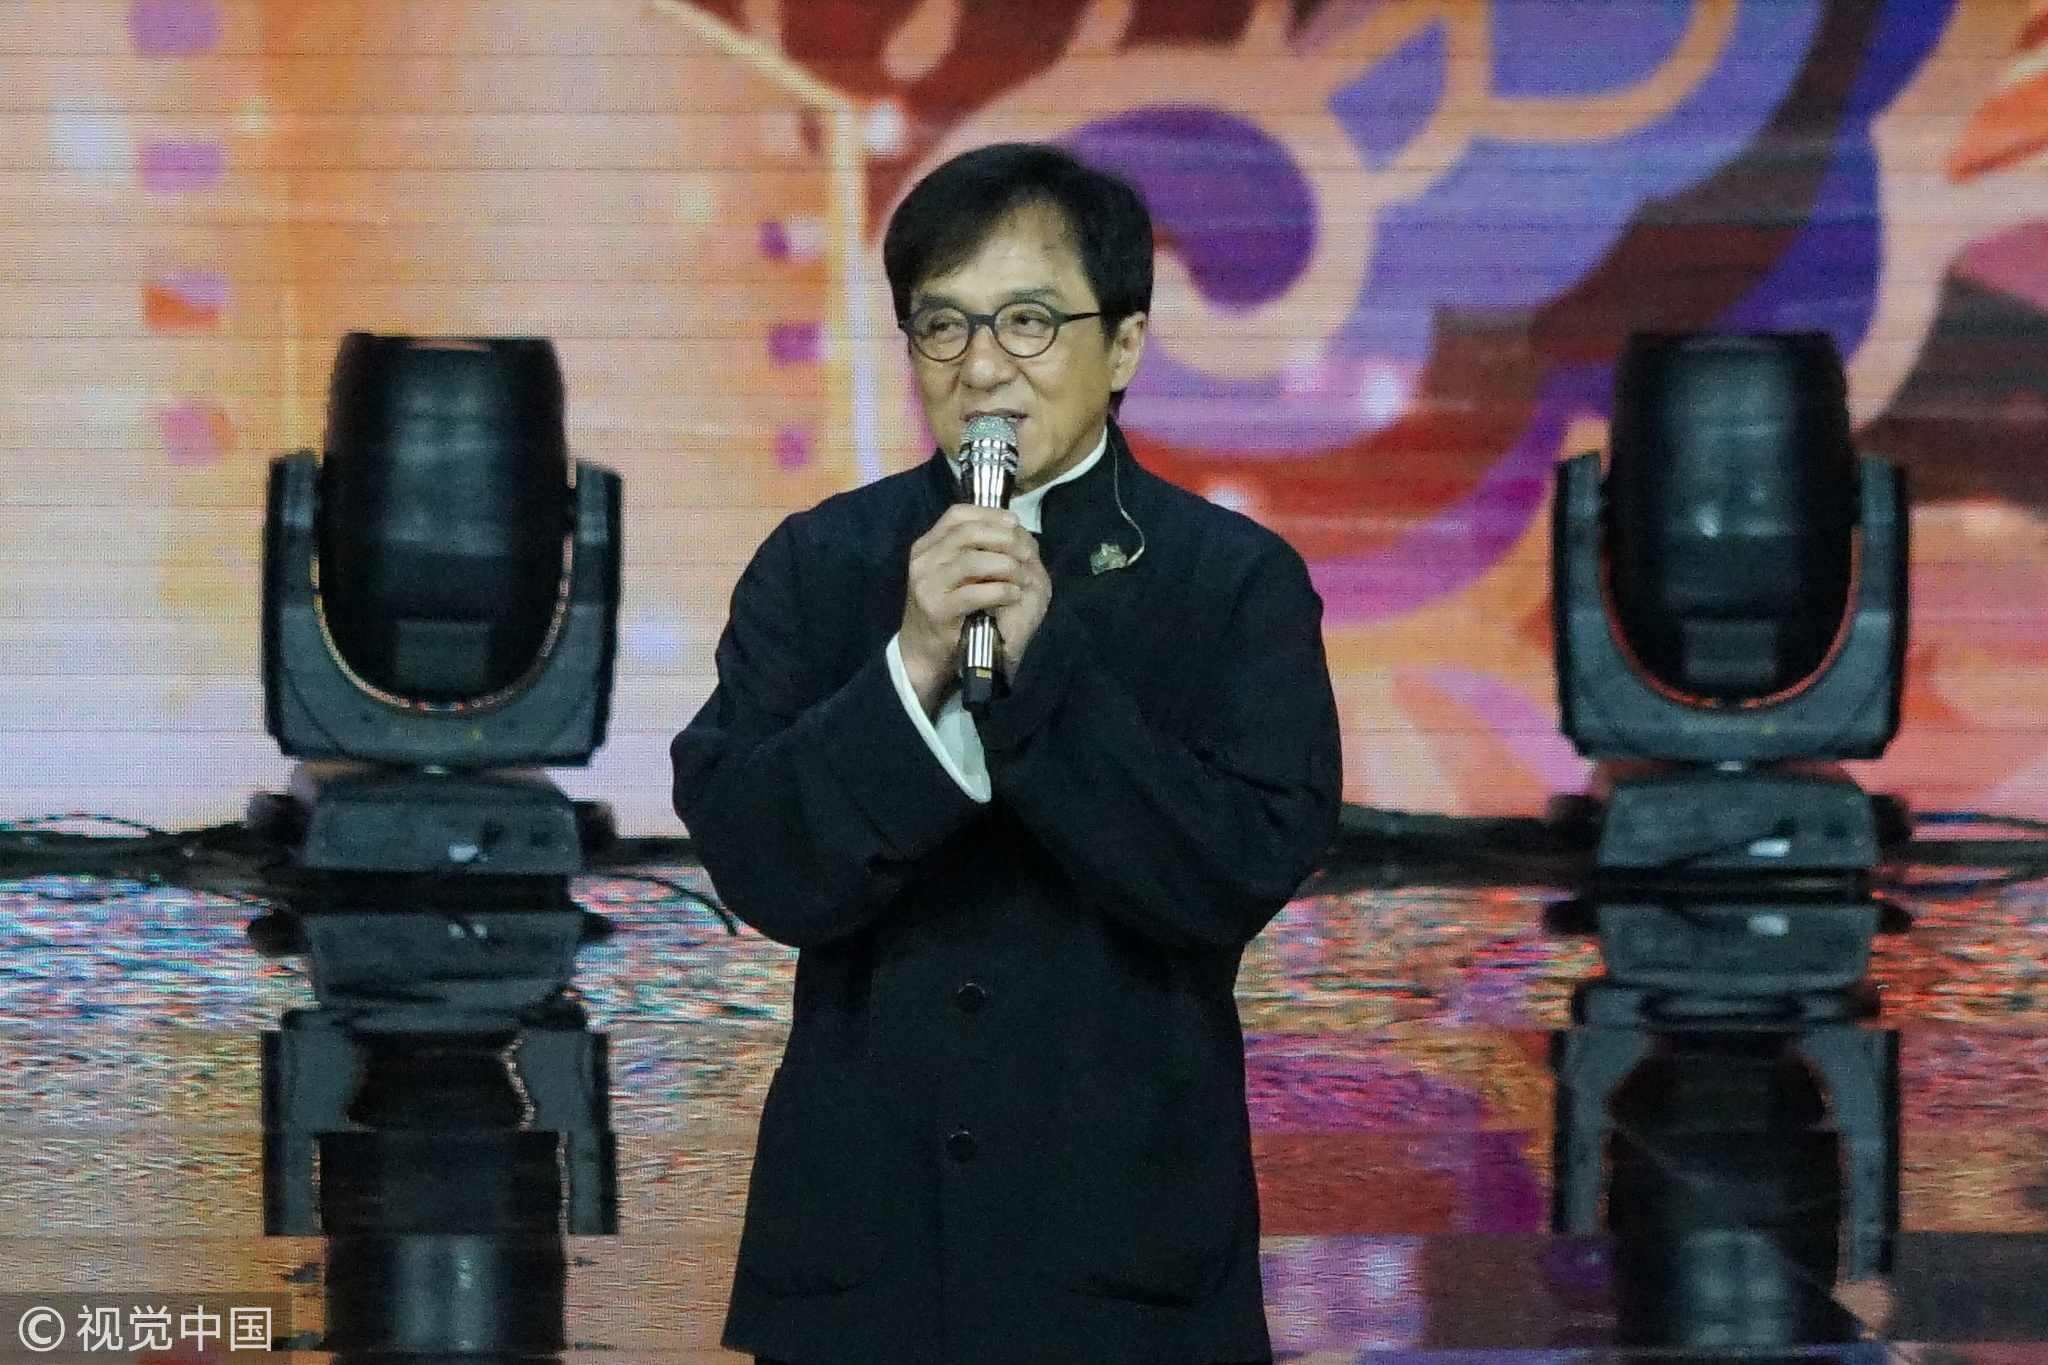 The first SCO Film Festival kicks off in Qingdao